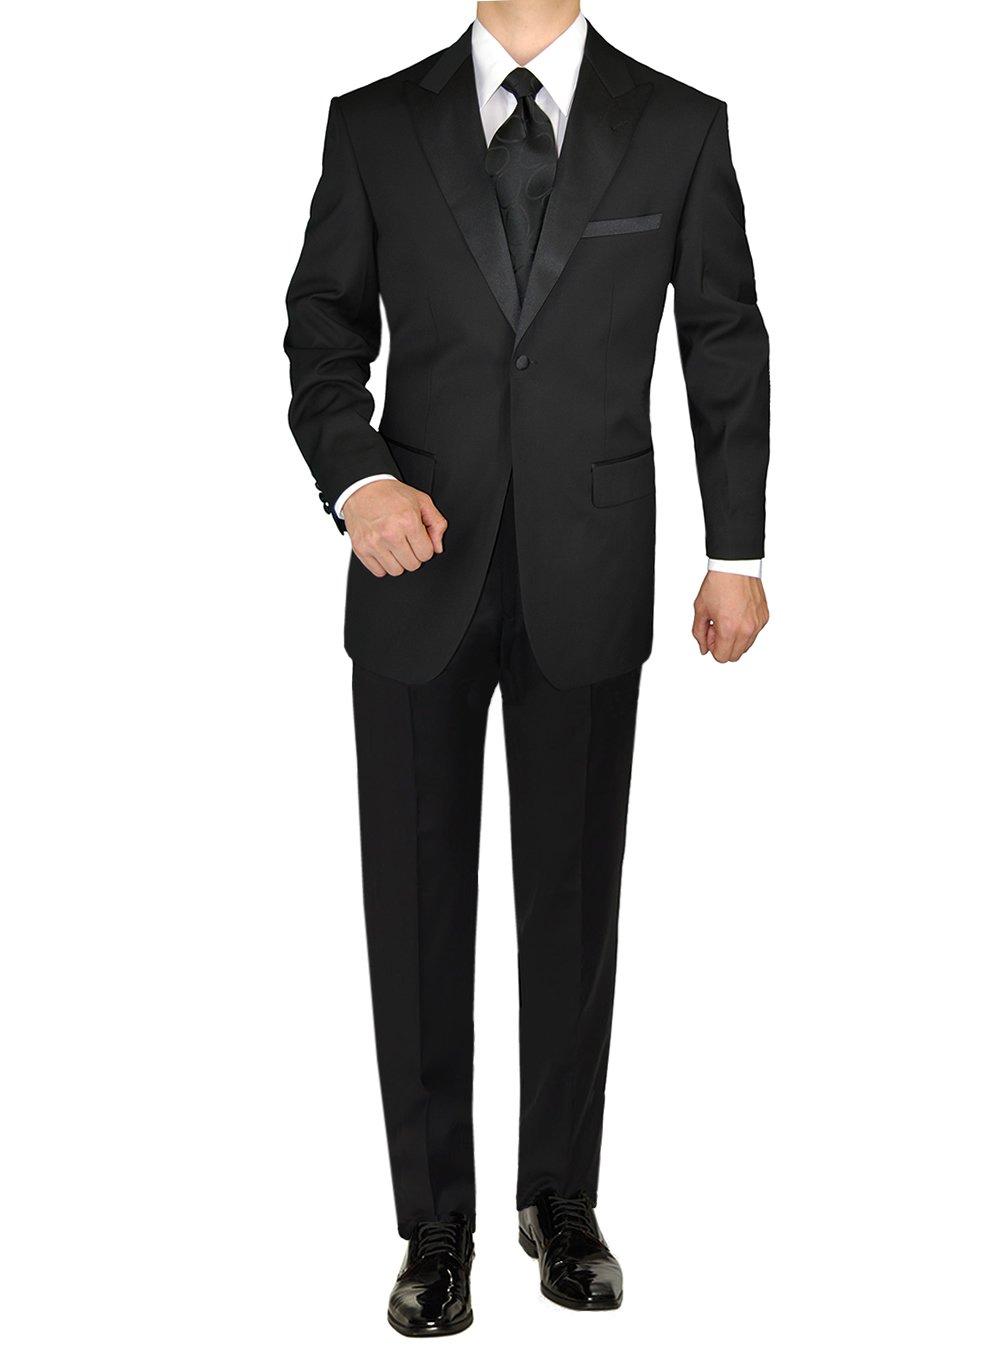 GN GIORGIO NAPOLI Men's Tuxedo Suit 1 Button Peak Lapel Adjustable Pants Black (54 Regular US / 64R EU/W 48'', Black)